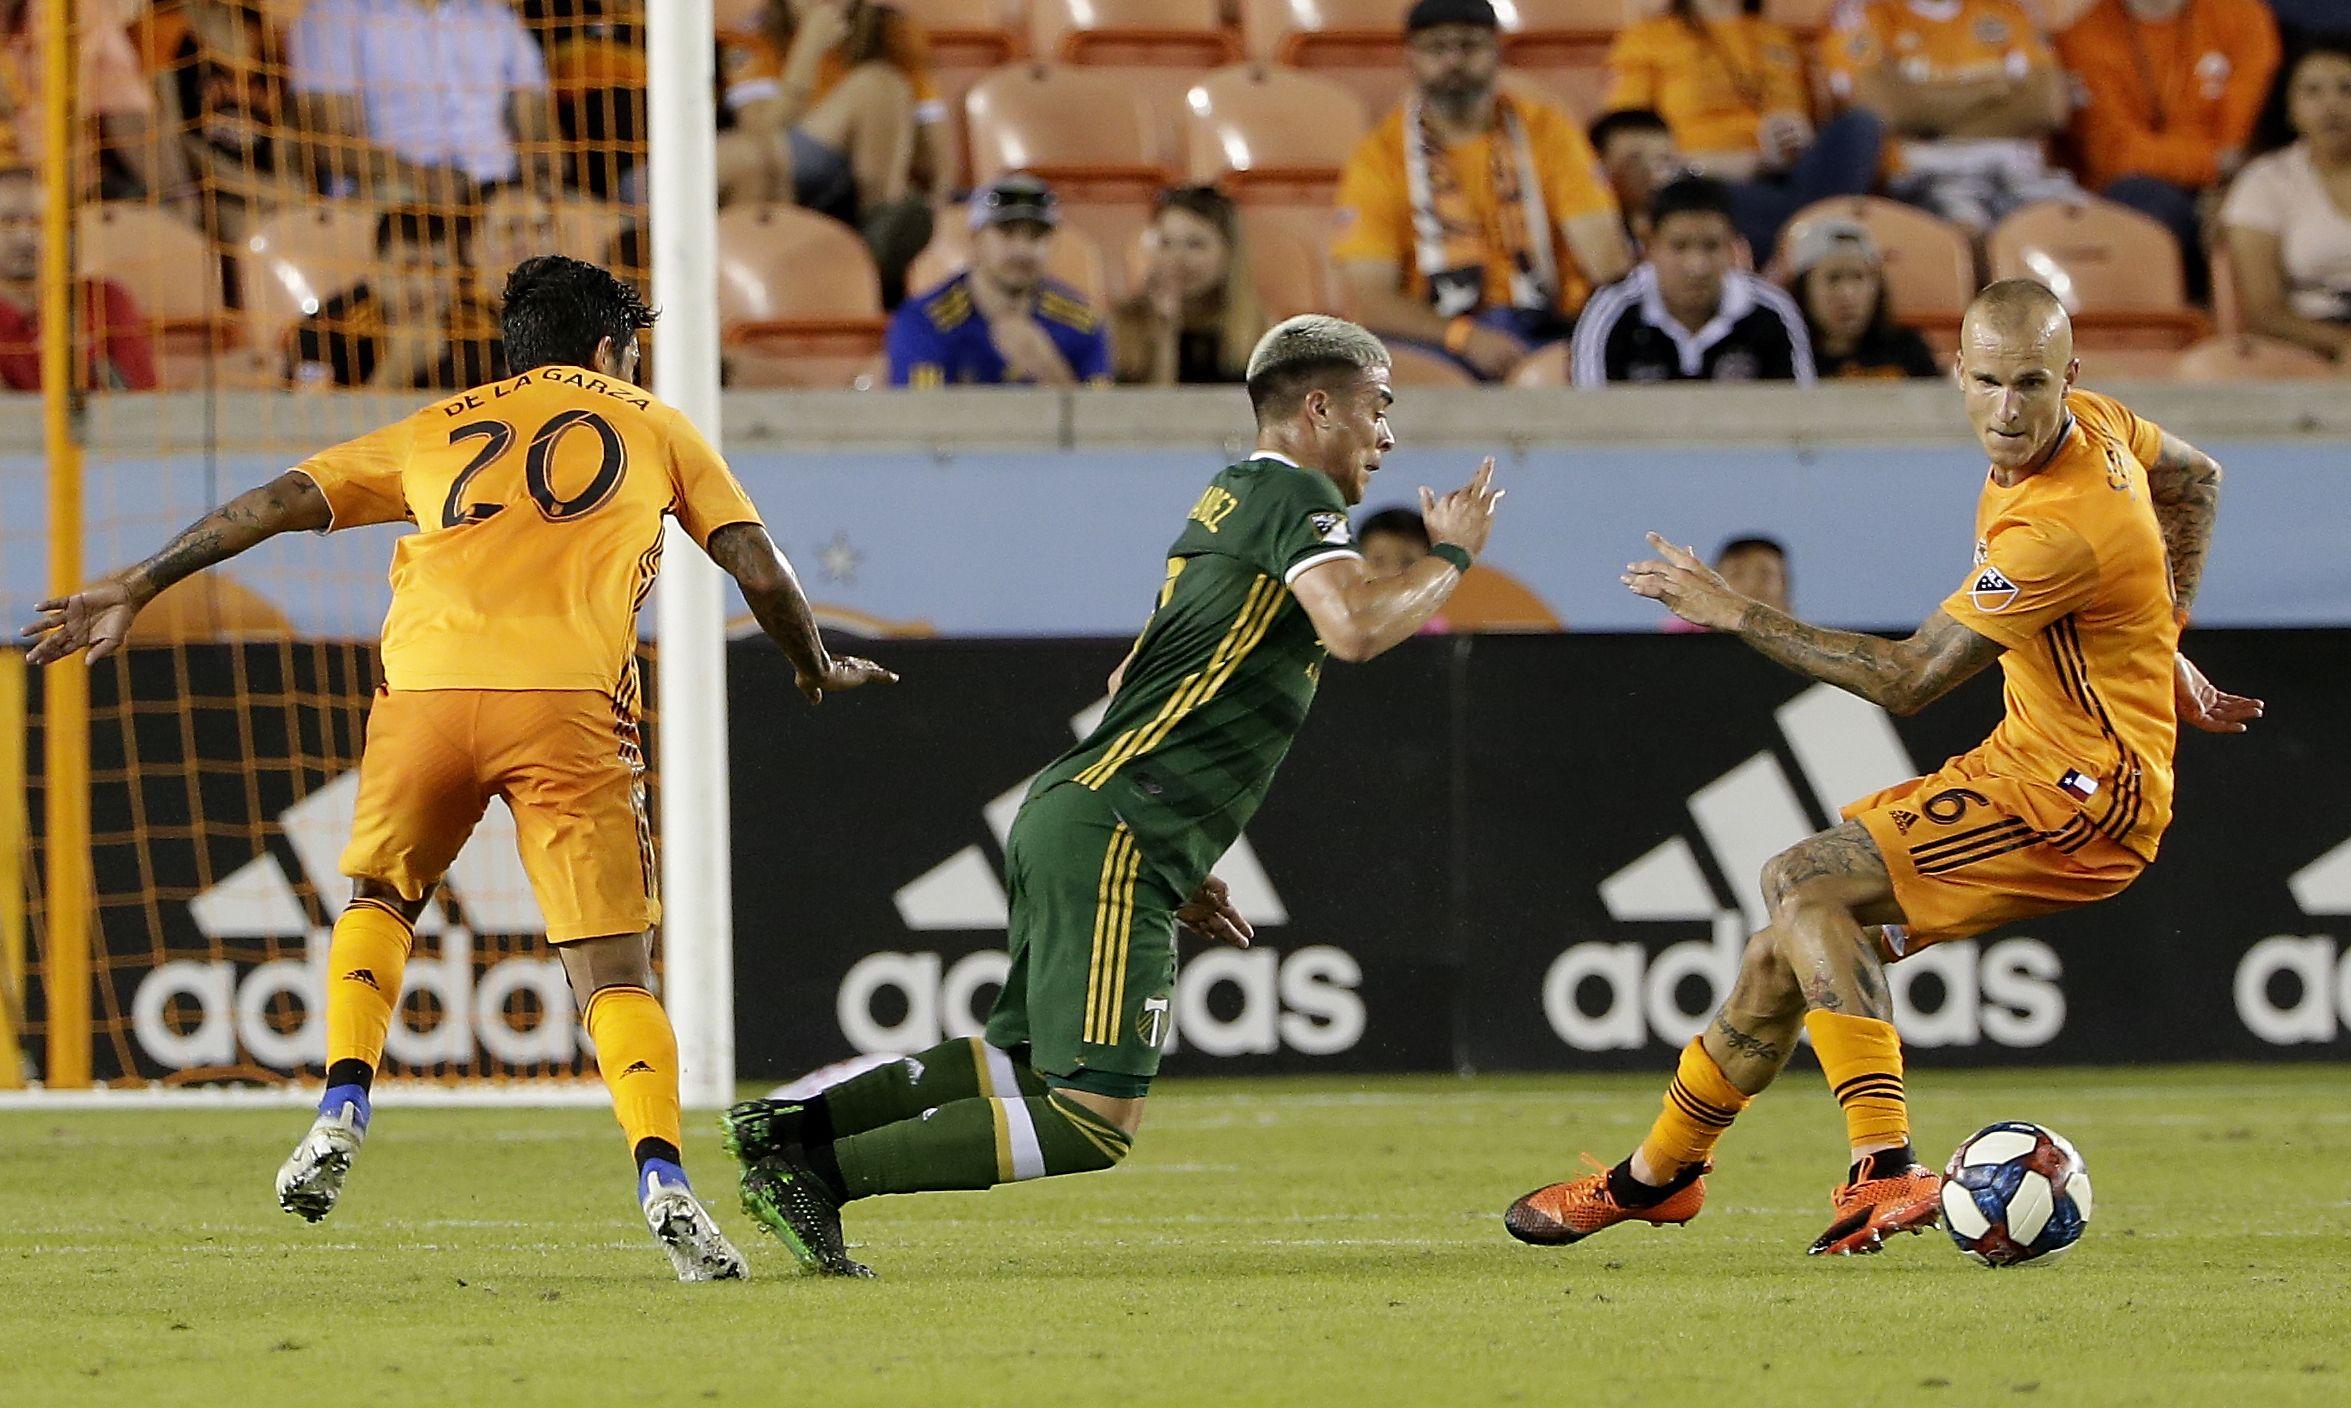 Fernández debuta con gol en MLS; Timbers empatan con Dynamo